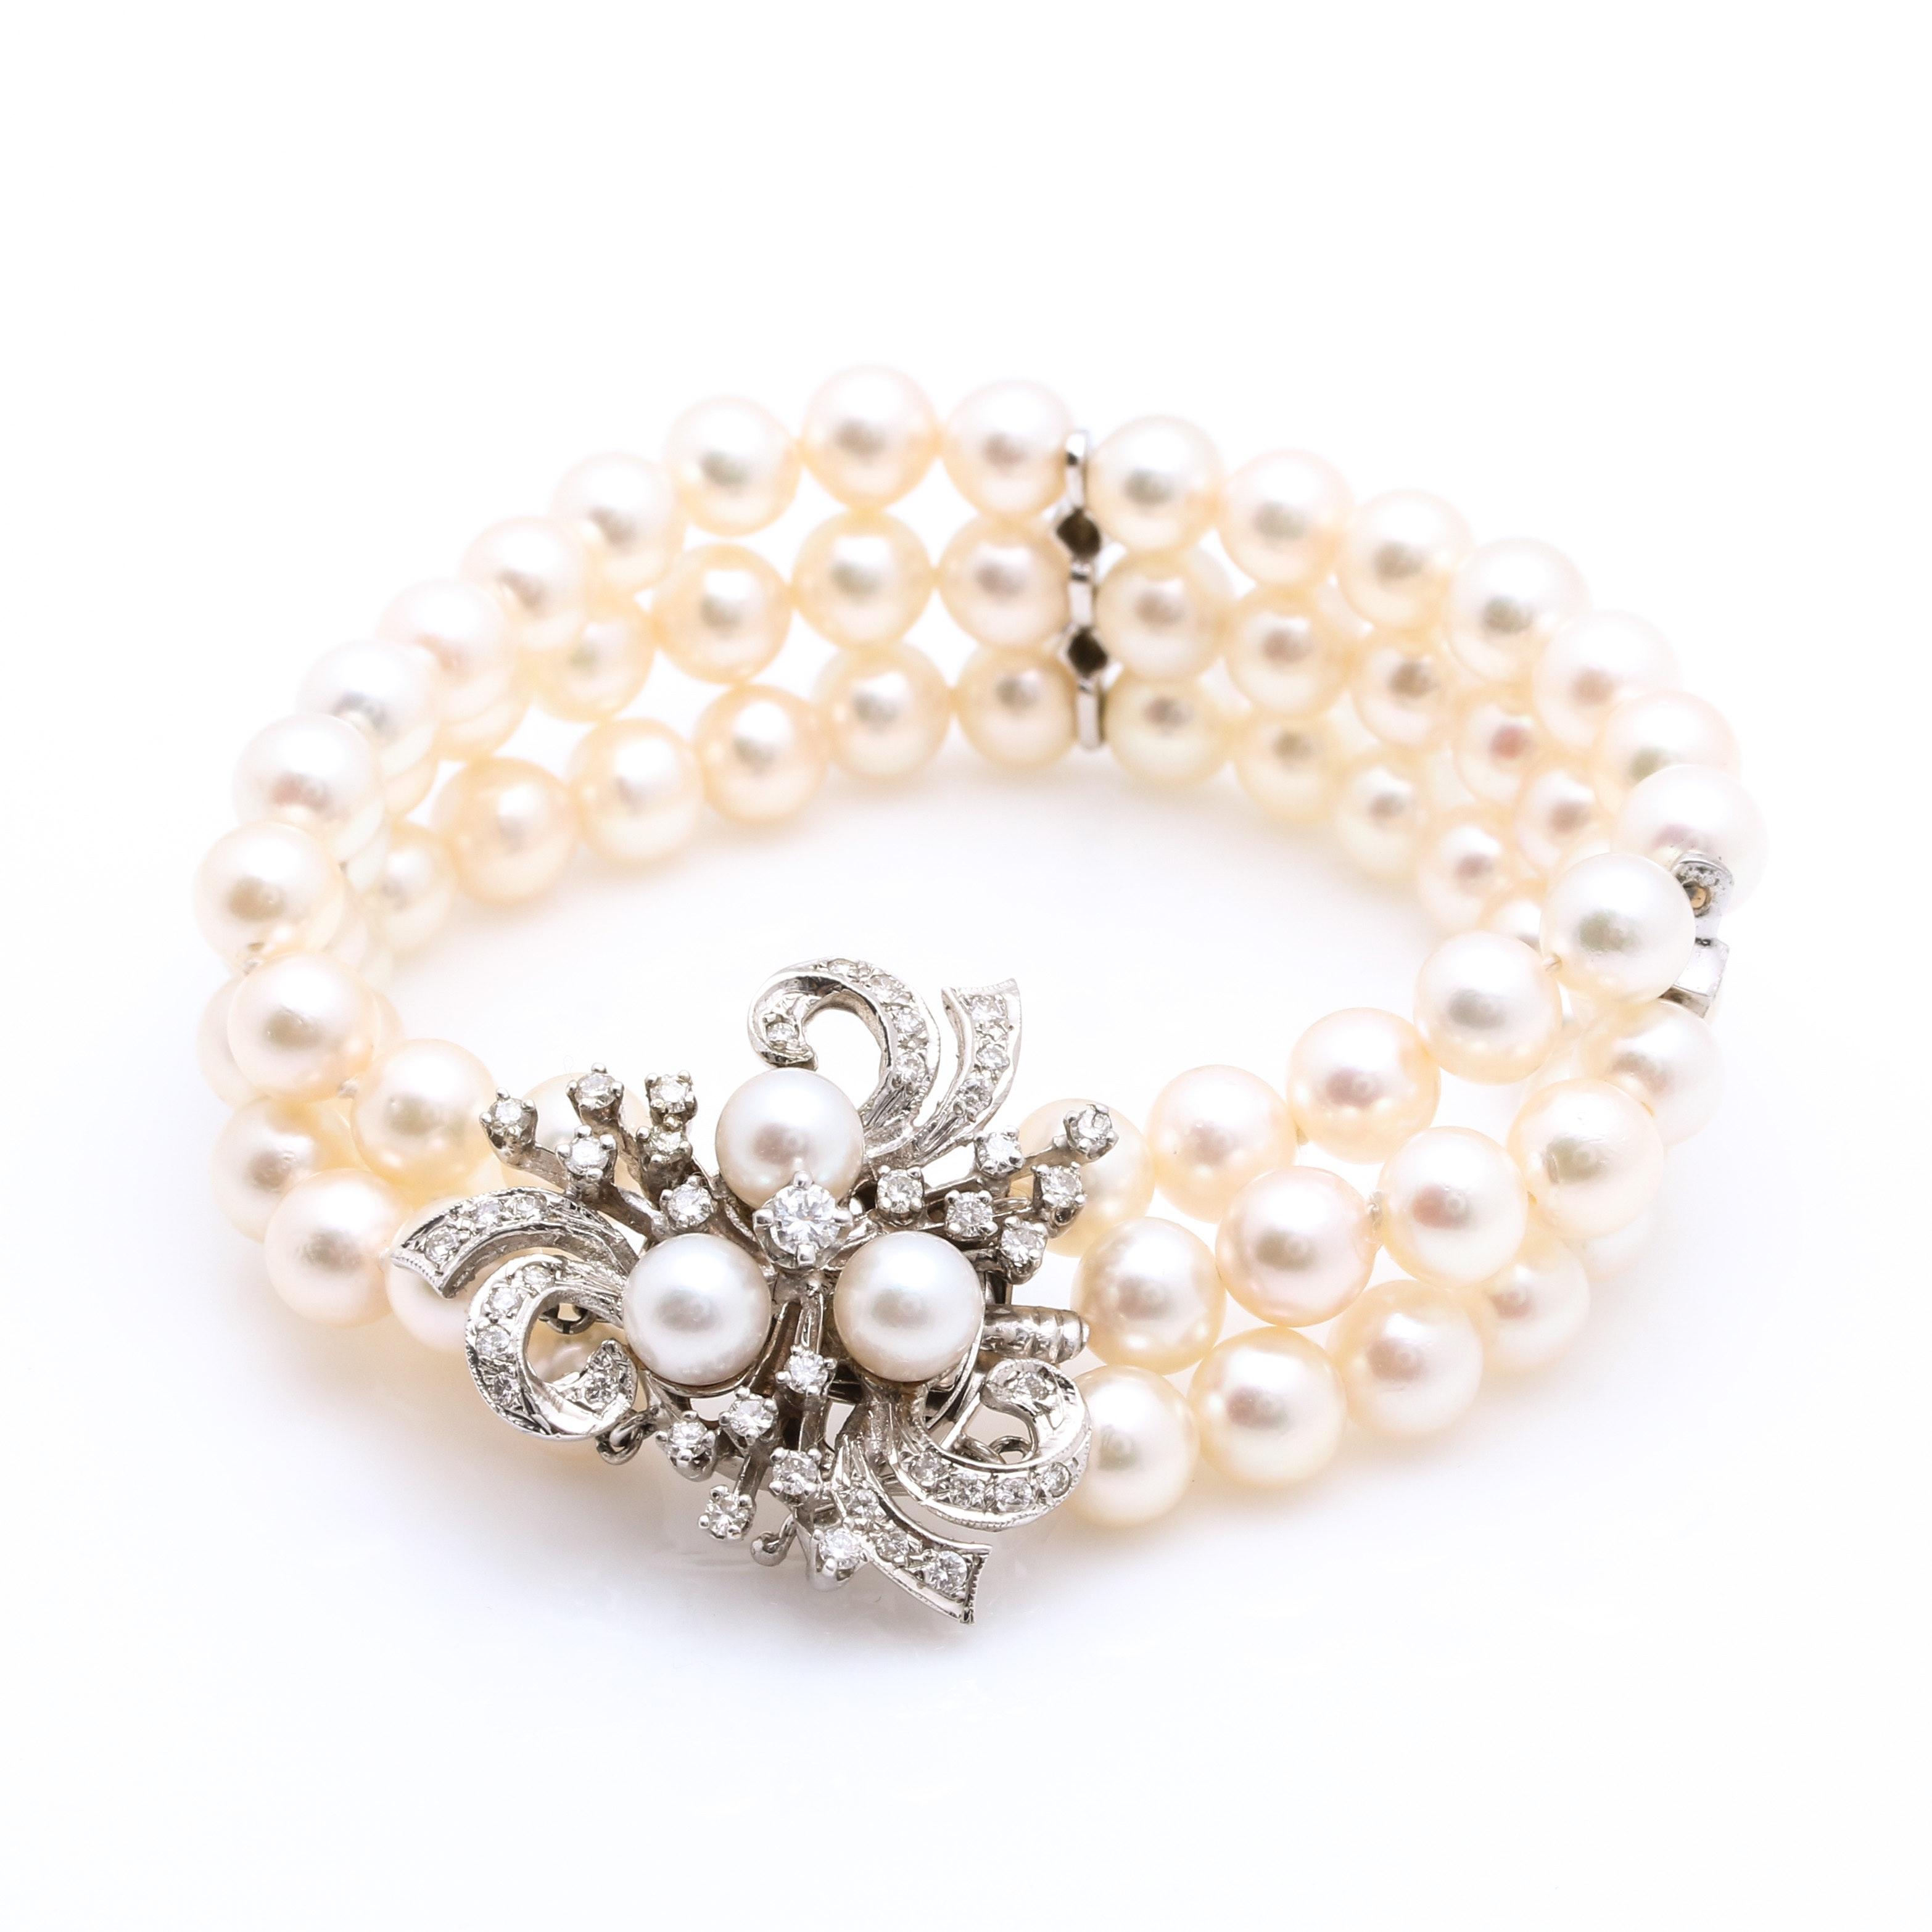 14K White Gold 0.96 CTW Diamond and Pearl Bracelet